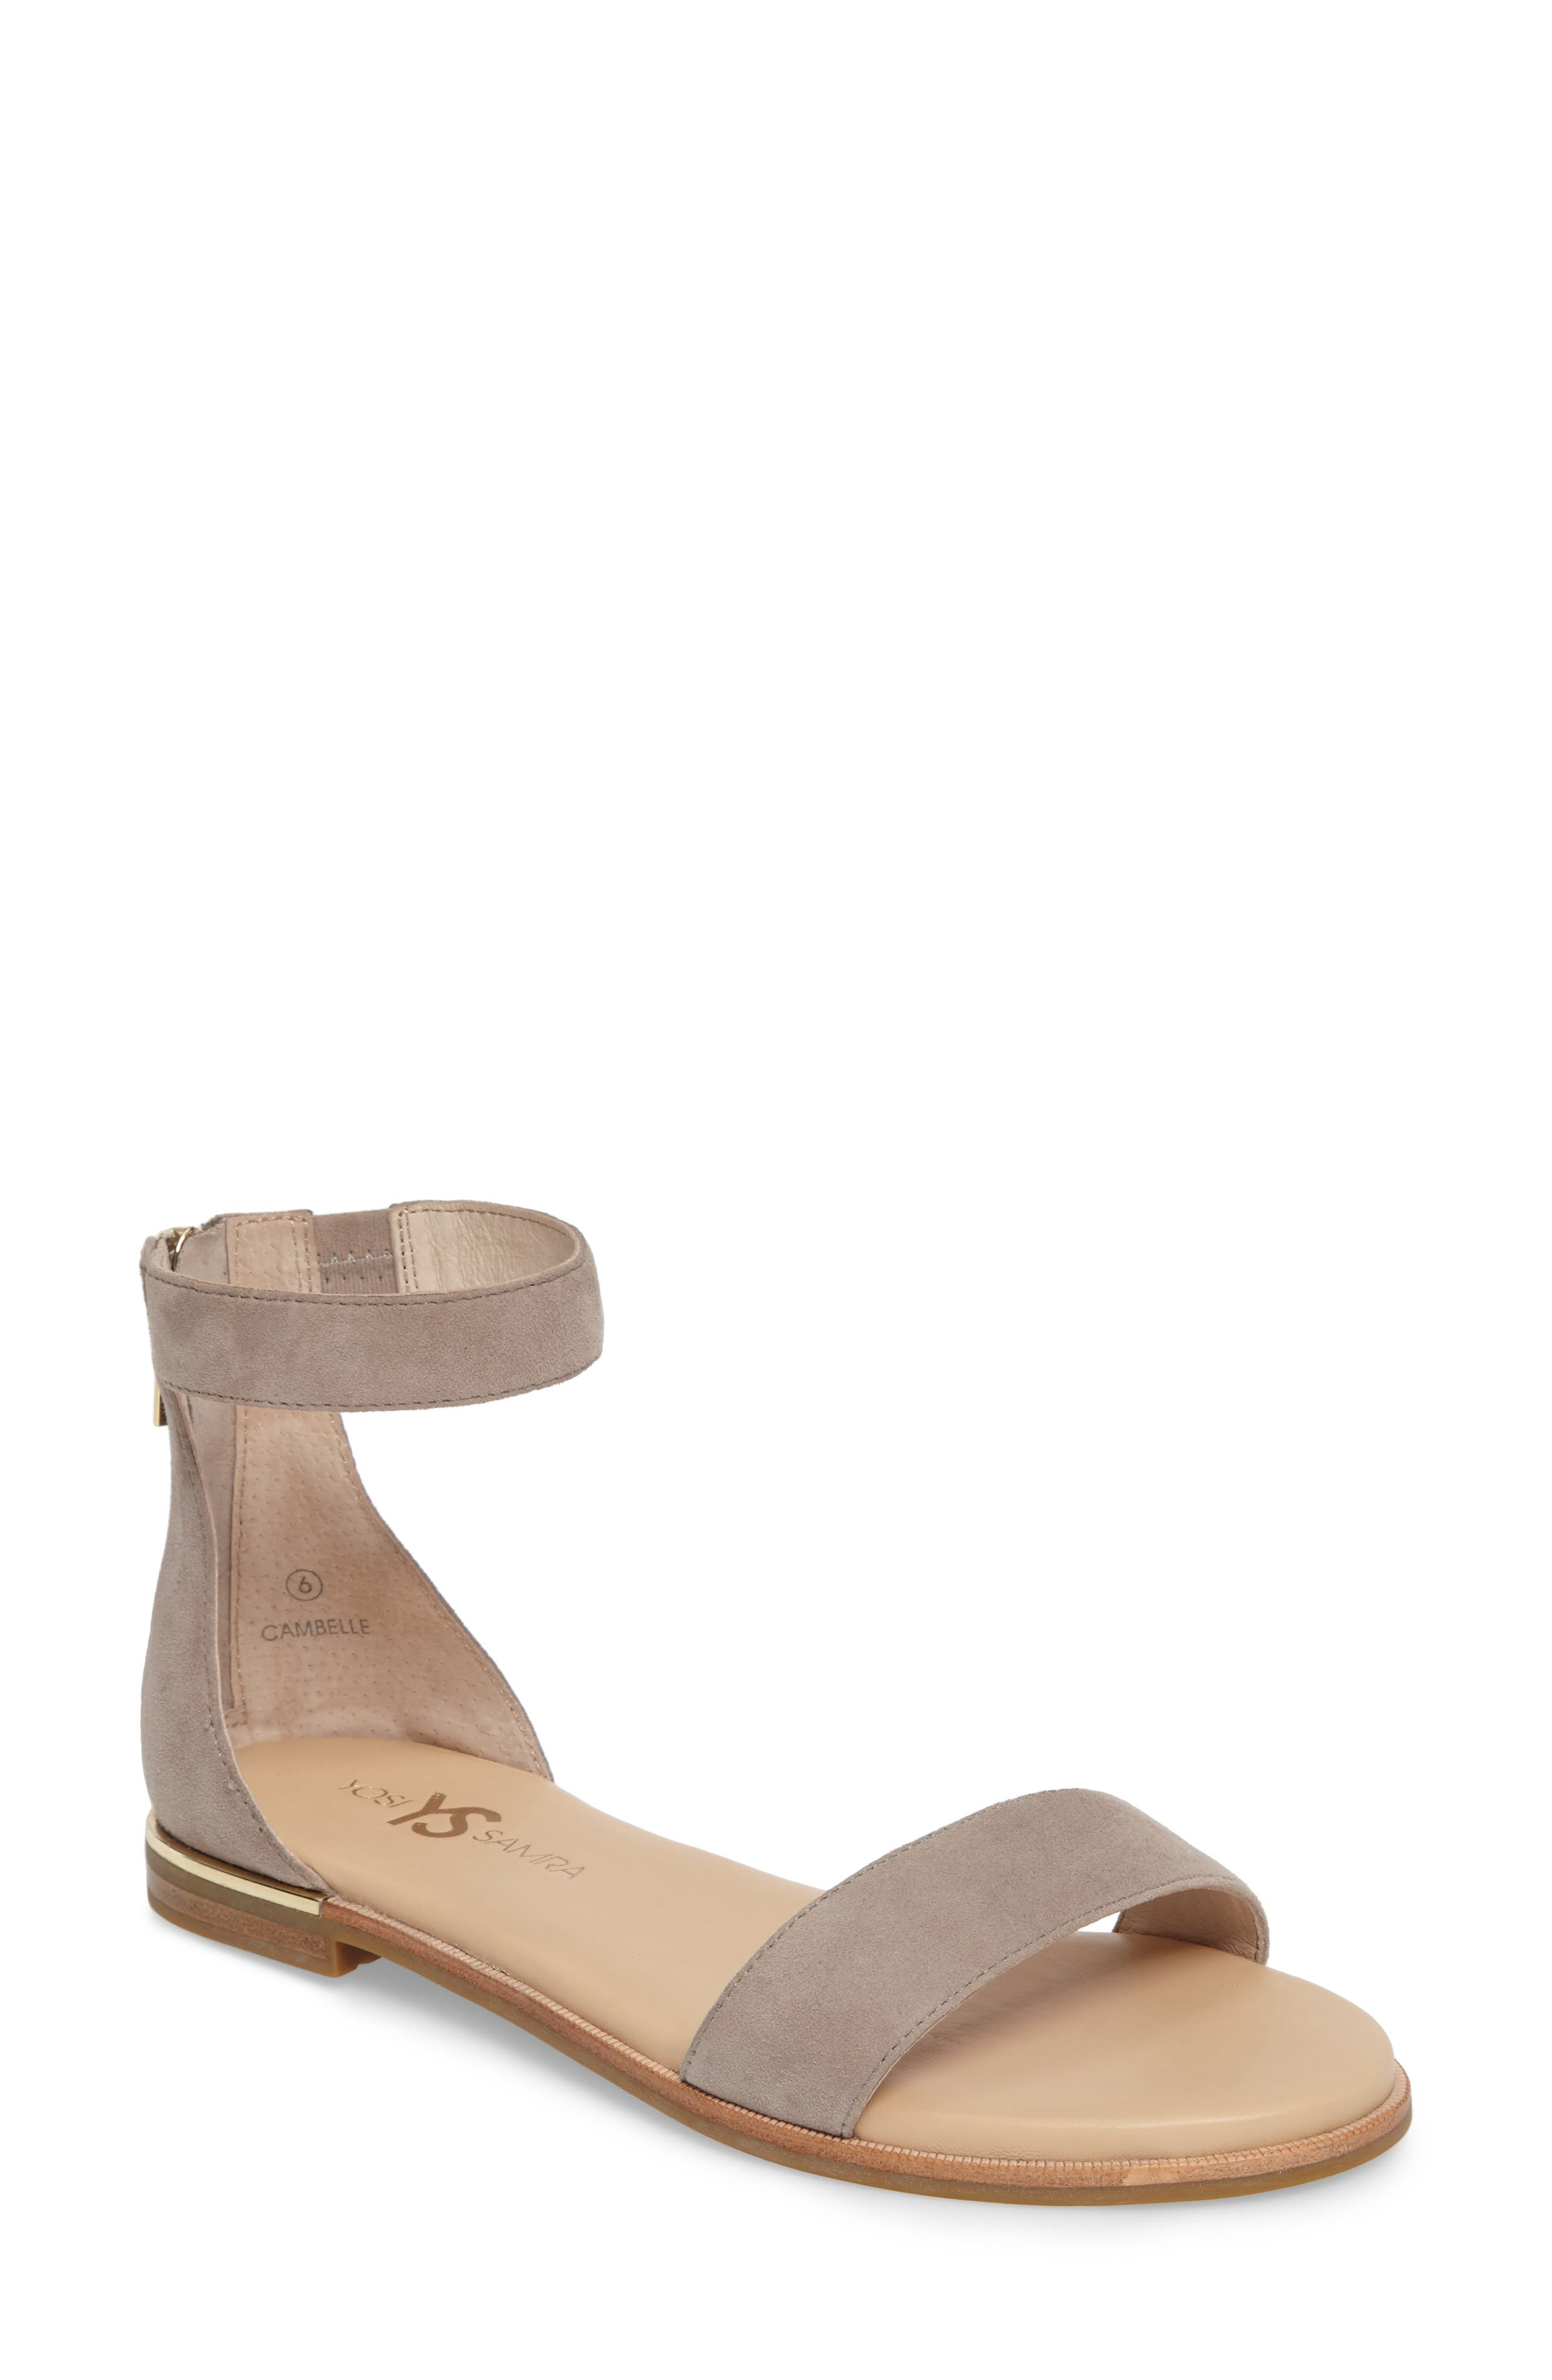 Yosi Samra 'Cambelle' Ankle Strap Sandal